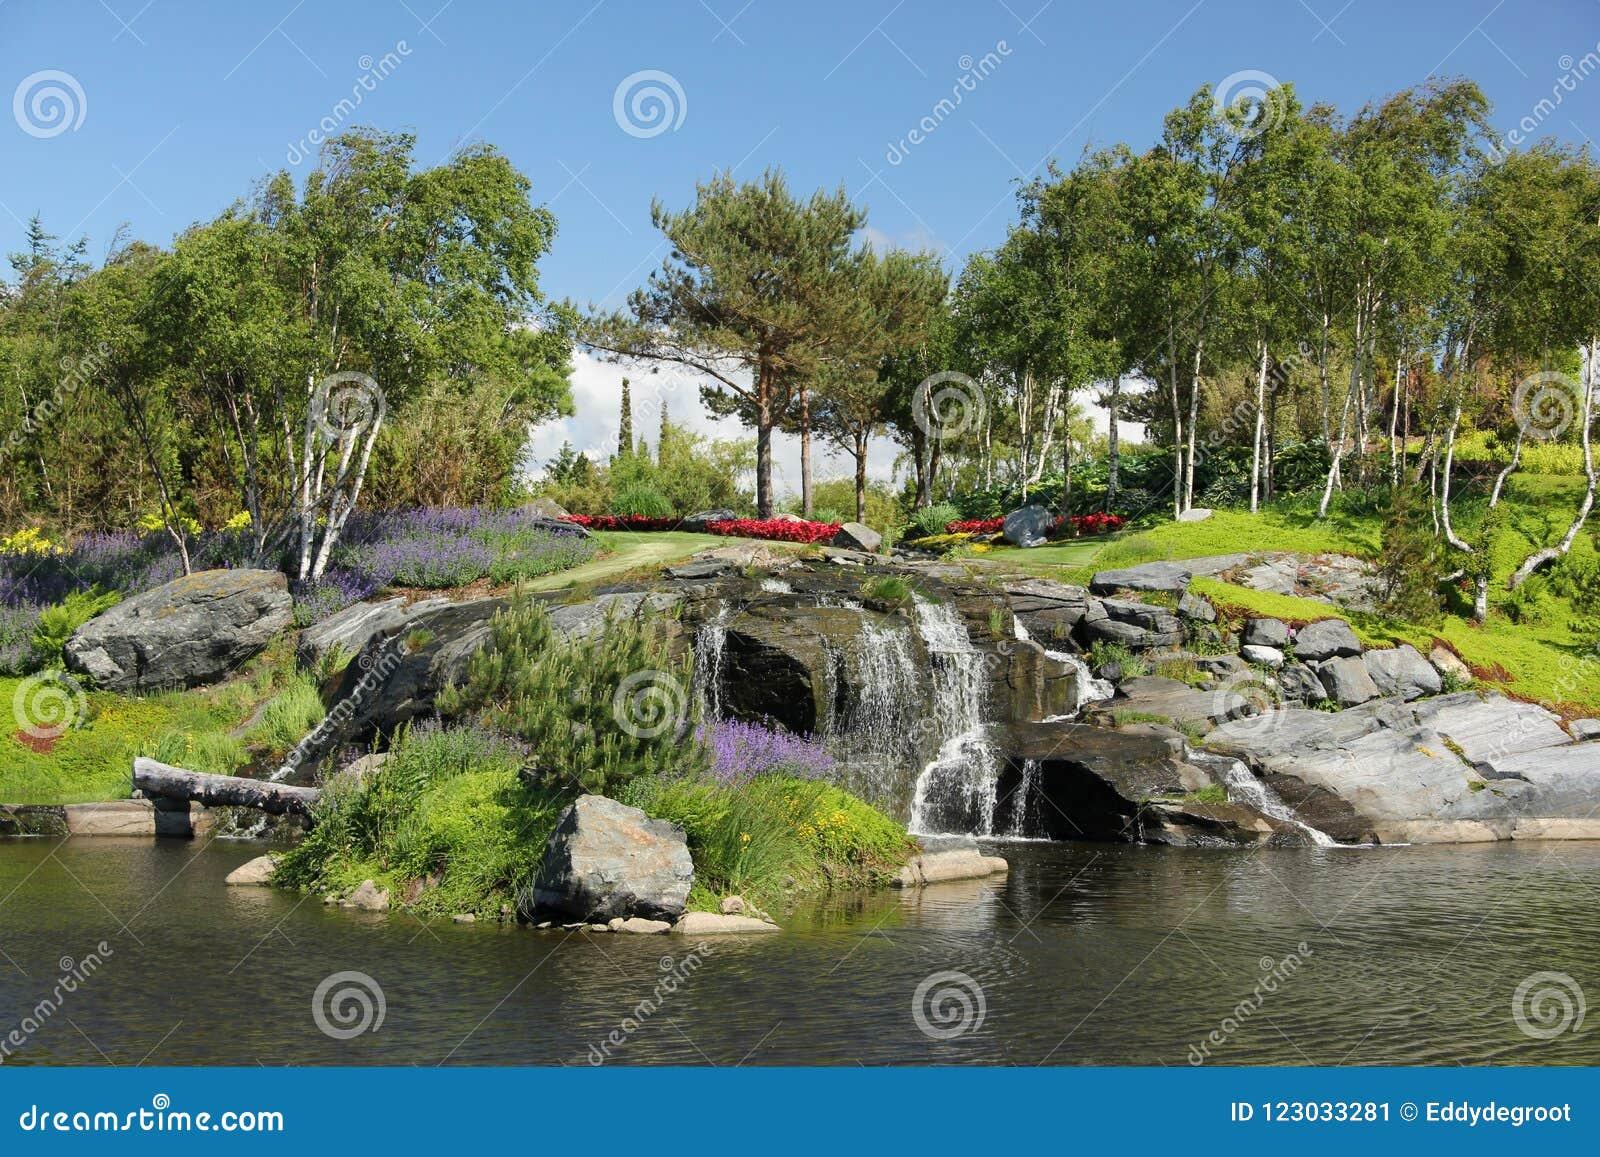 Les jardins à l og Fjaere de Flor